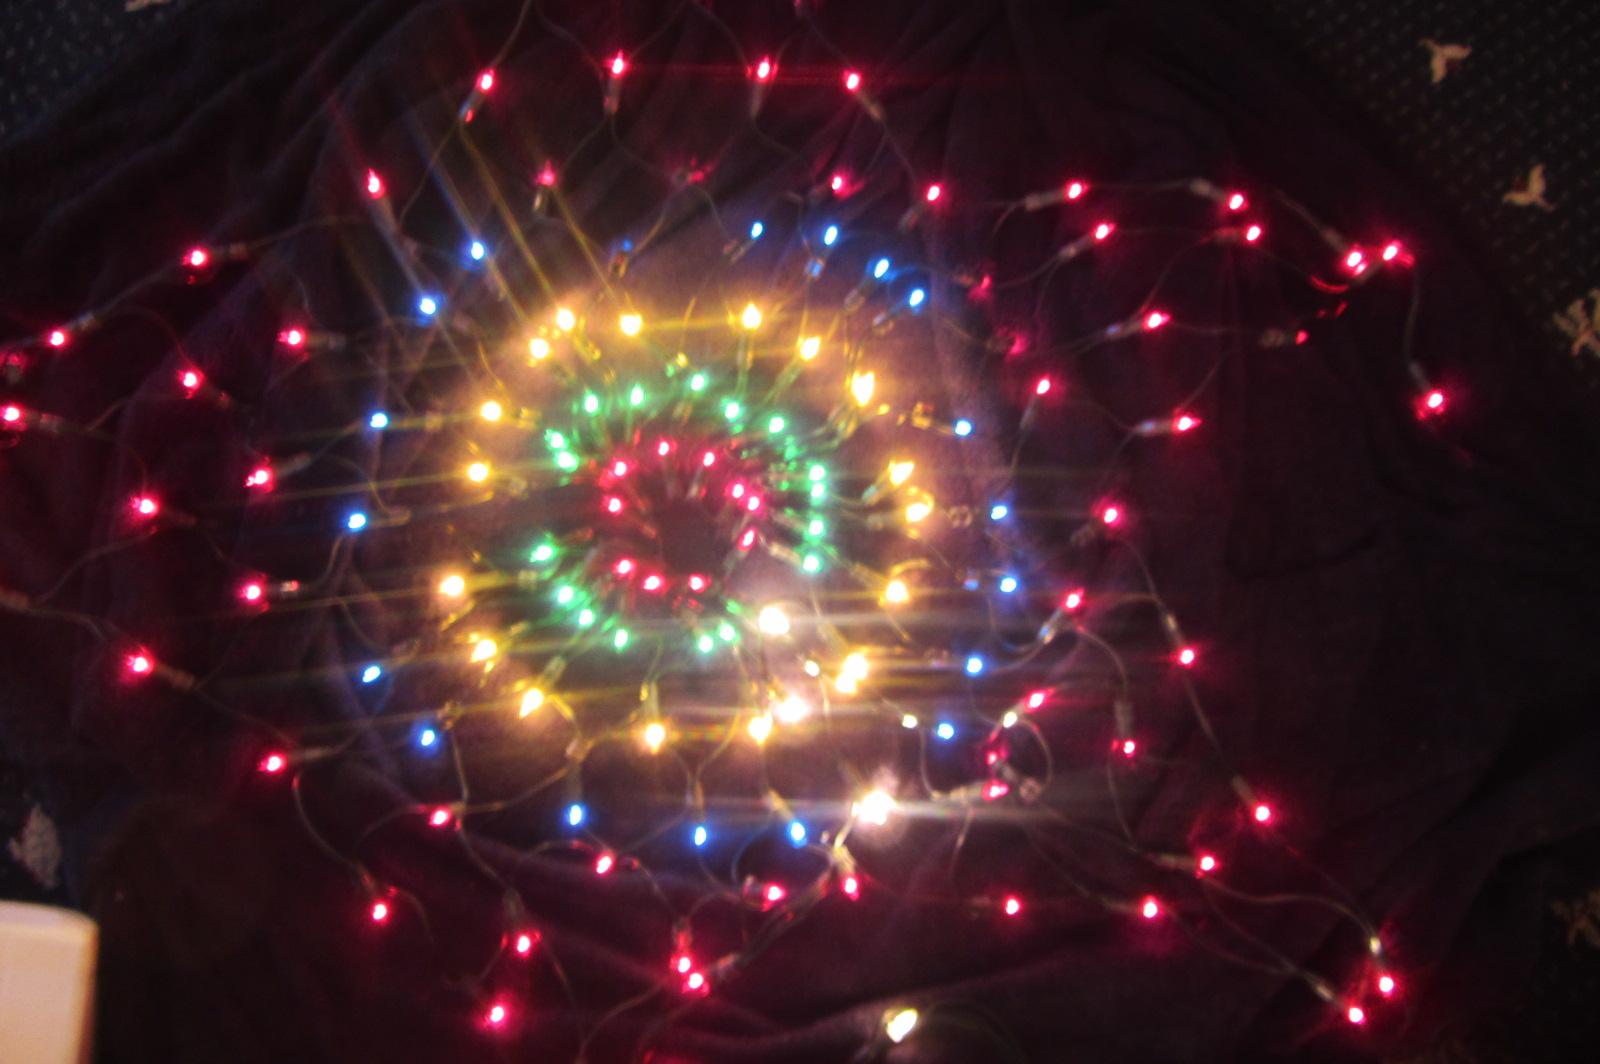 140 STAR NET LIGHTS MULTI FUNCTION LIGHTS CHRISTMAS